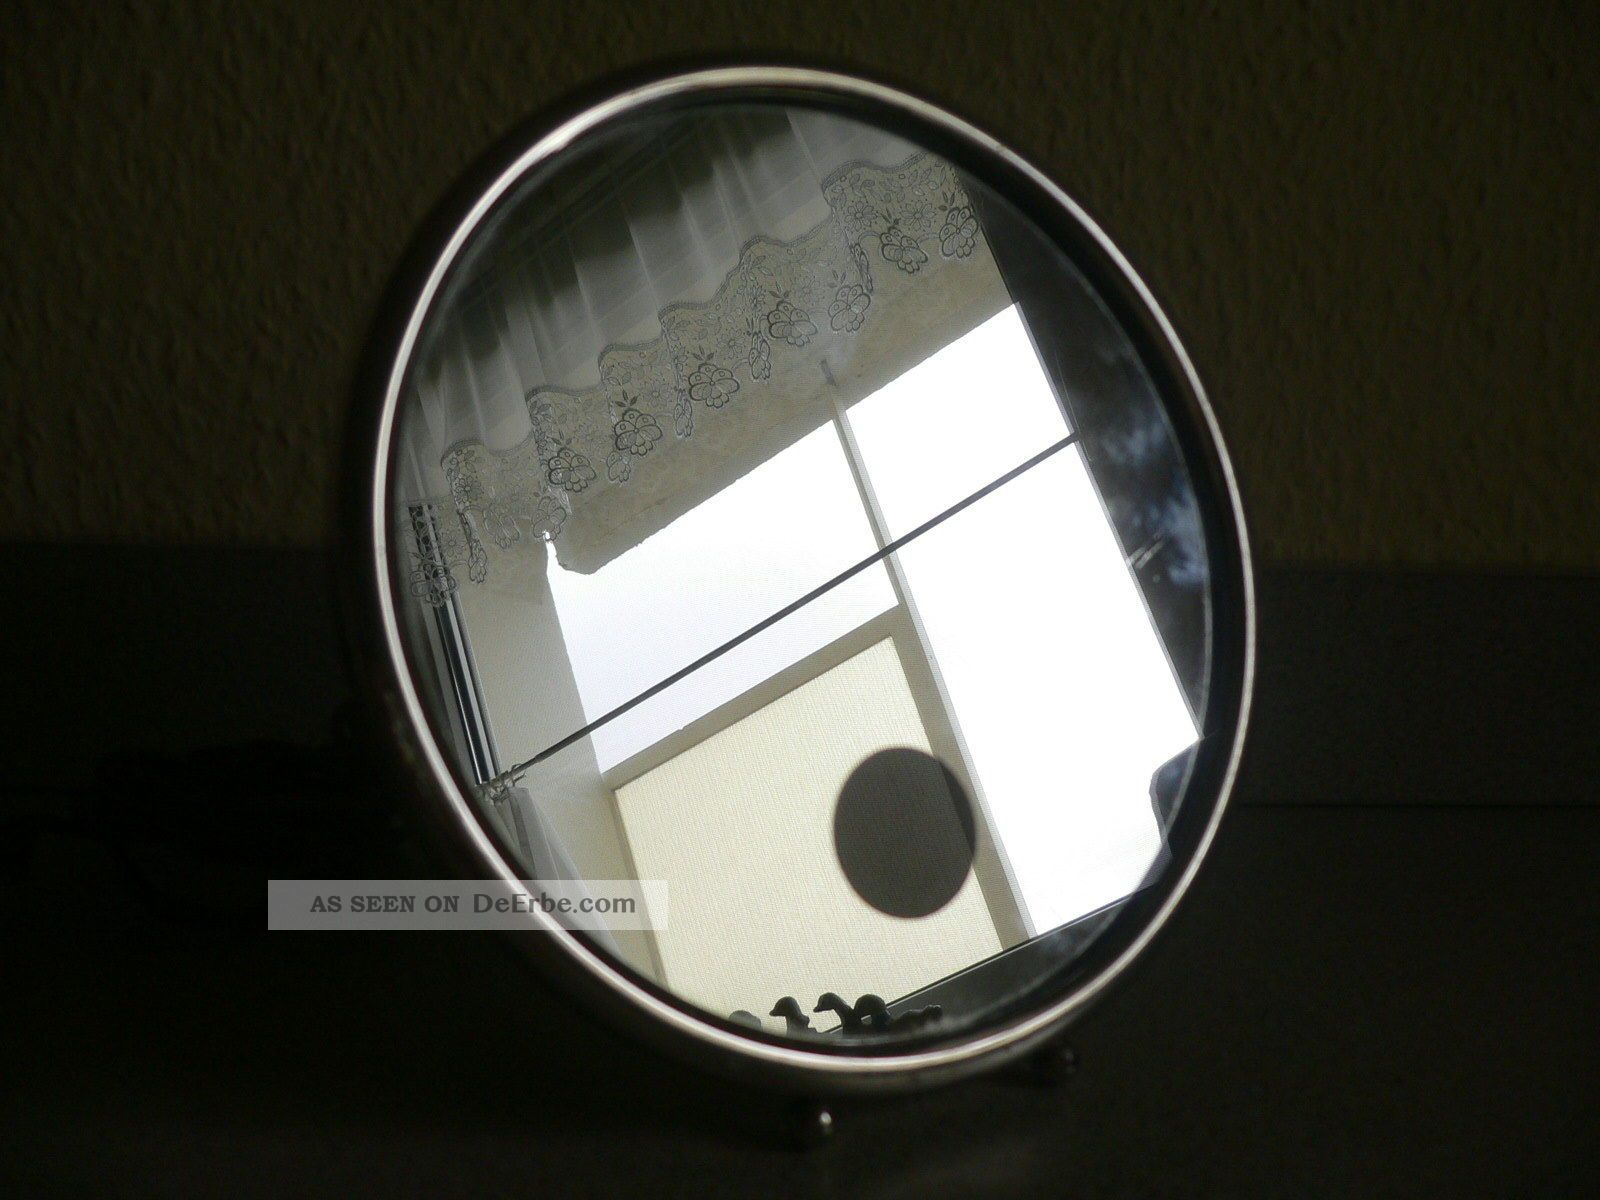 spiegel rasierspiegel kosmetikspiegel mit lampe artdeco. Black Bedroom Furniture Sets. Home Design Ideas